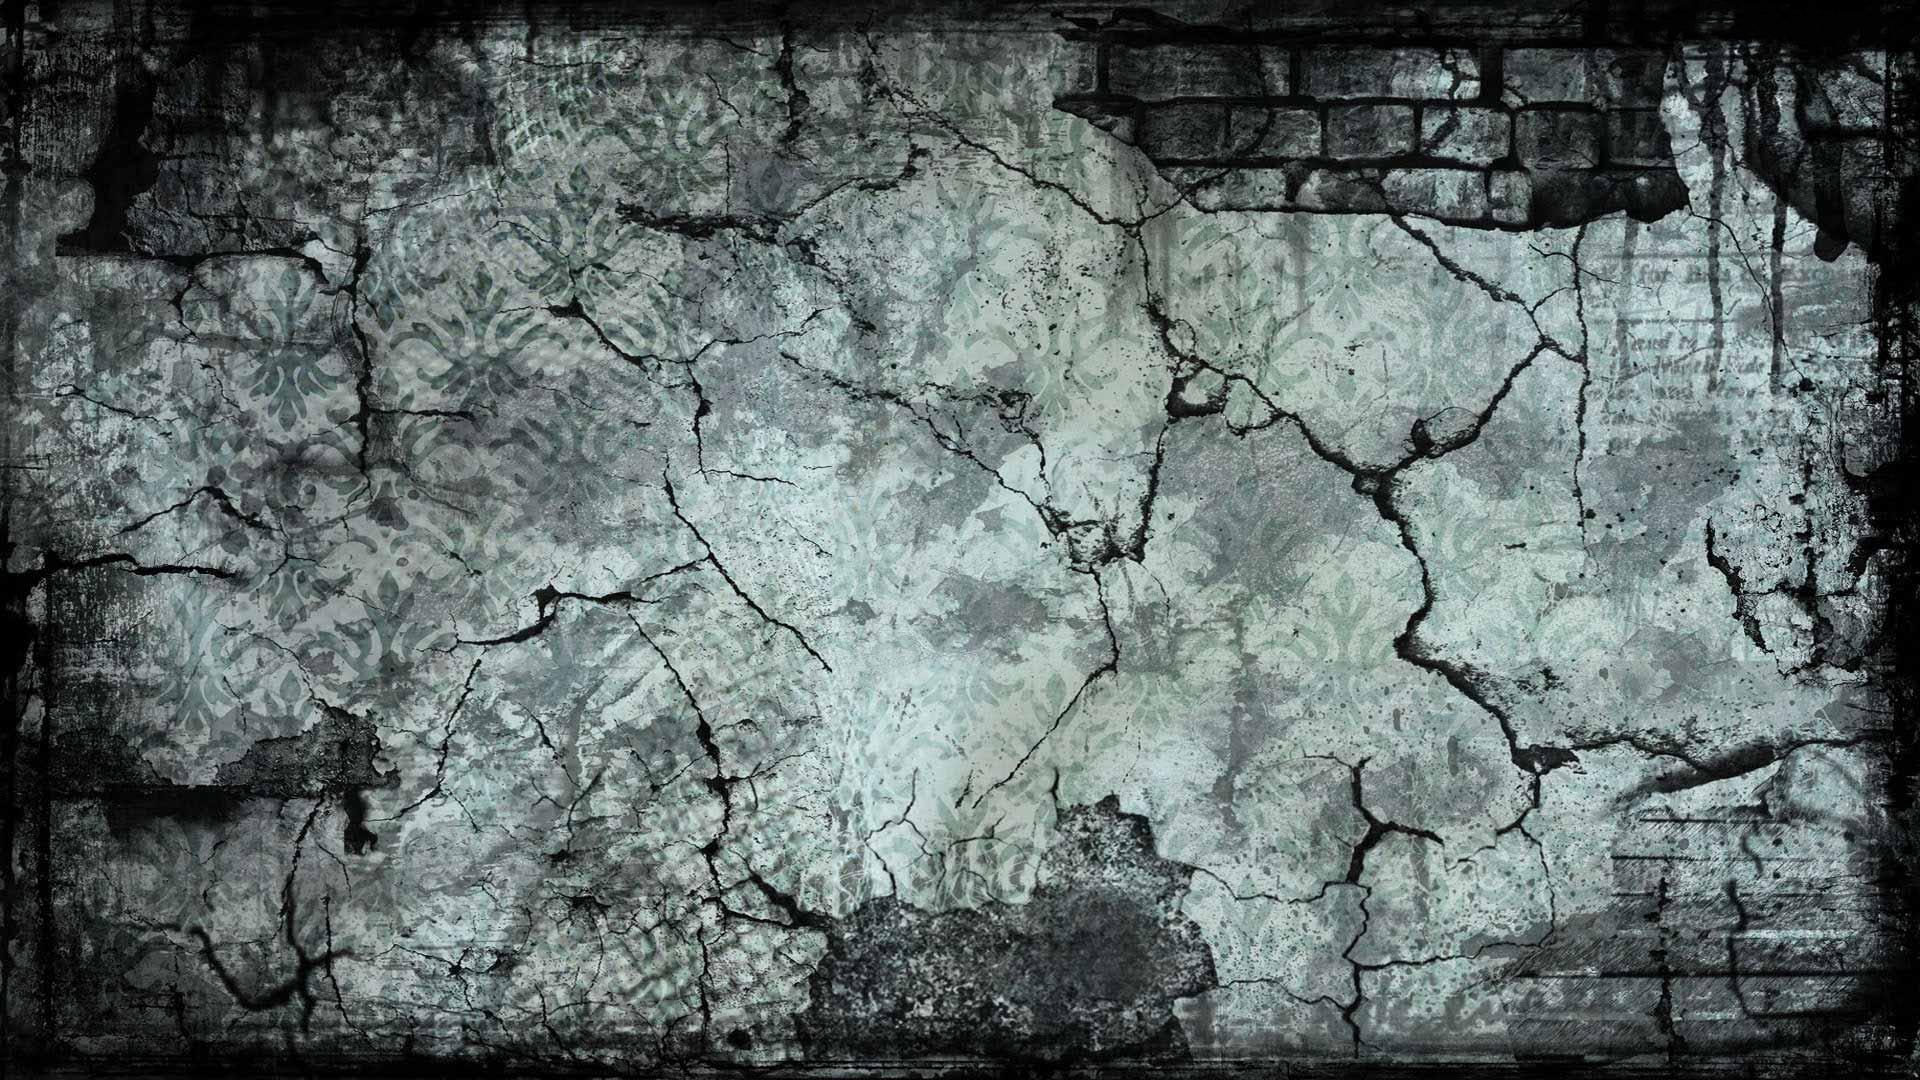 Hd Vintage Backgrounds - HD Wallpaper